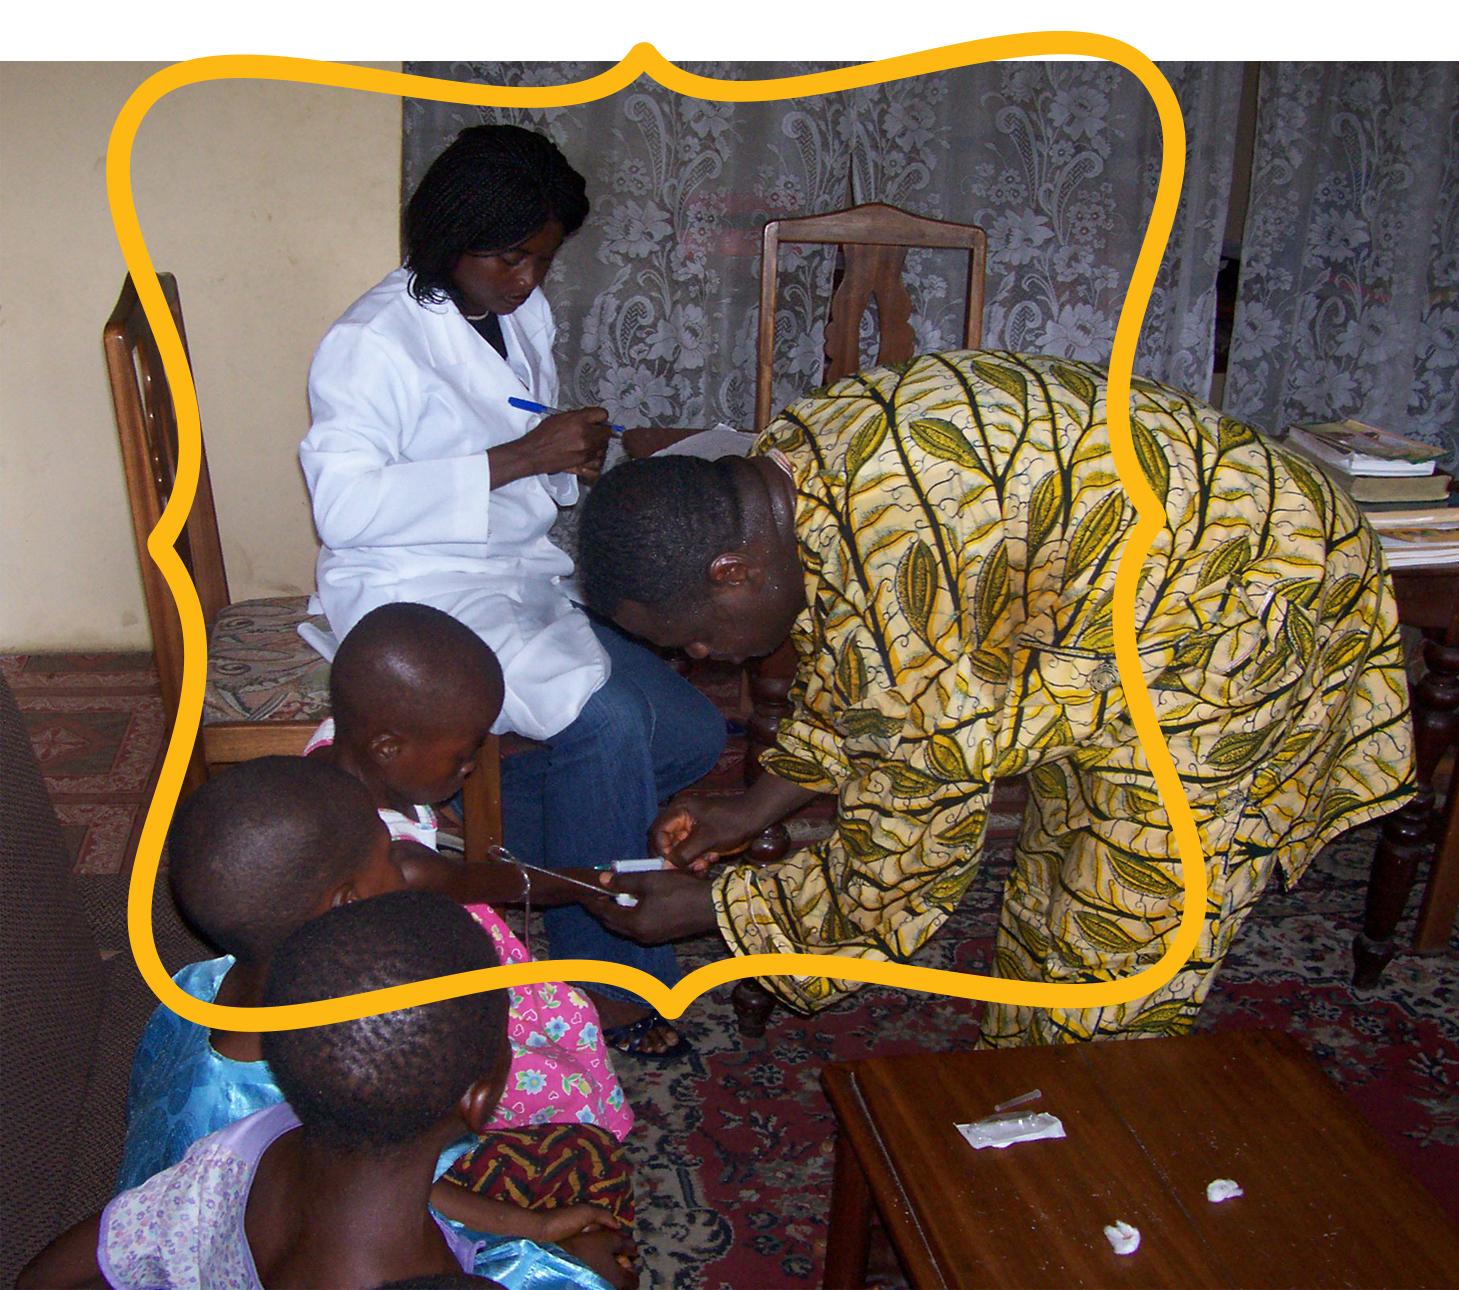 Street children receiving medical care